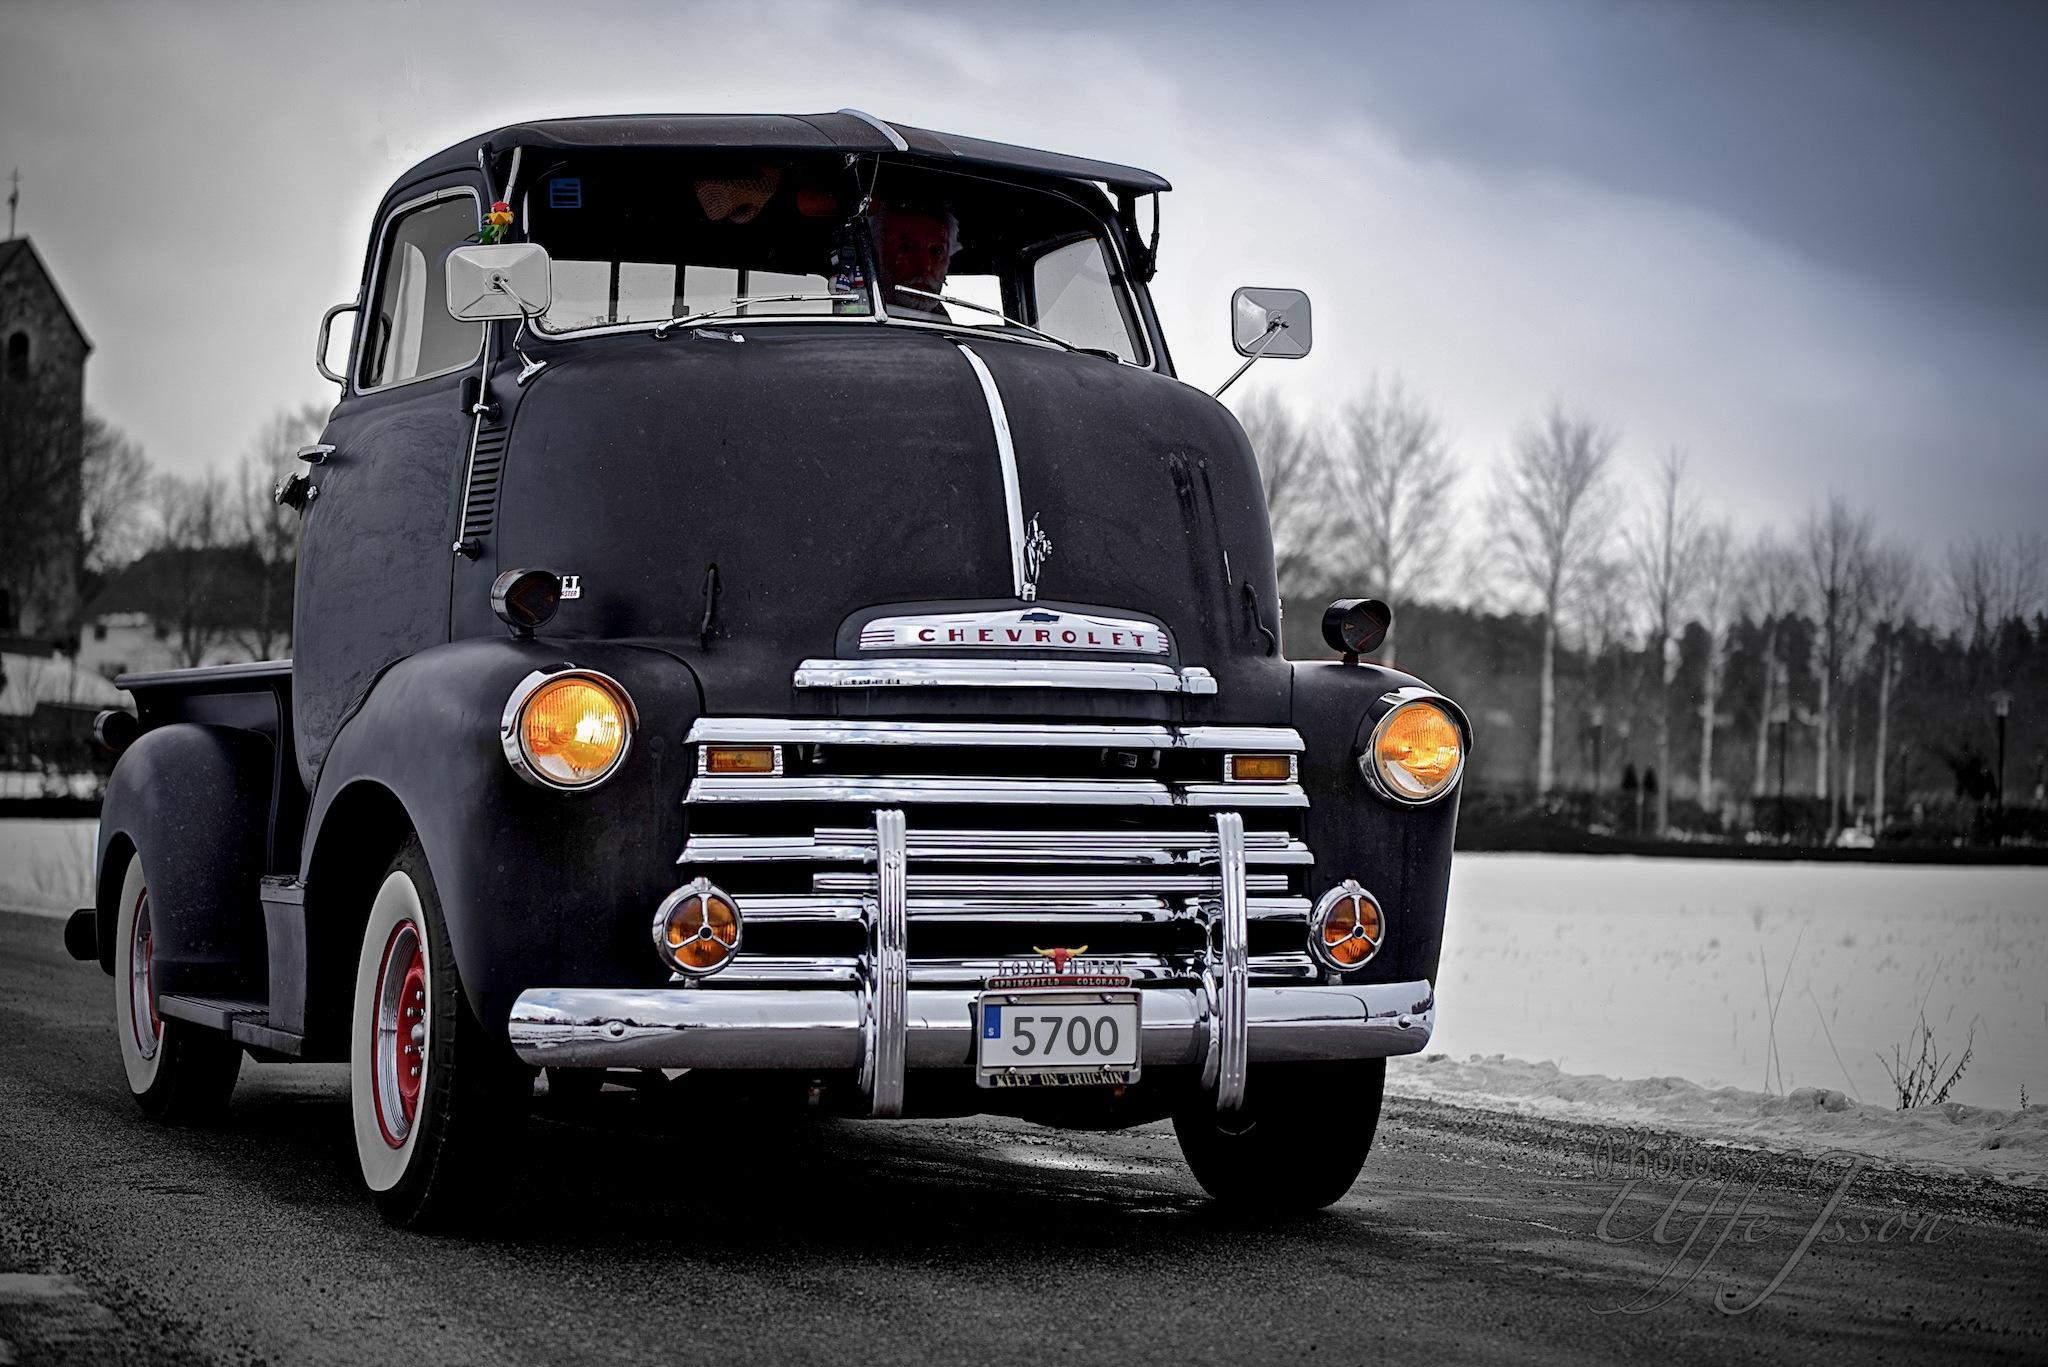 Chevrolet Coe by uffejsson